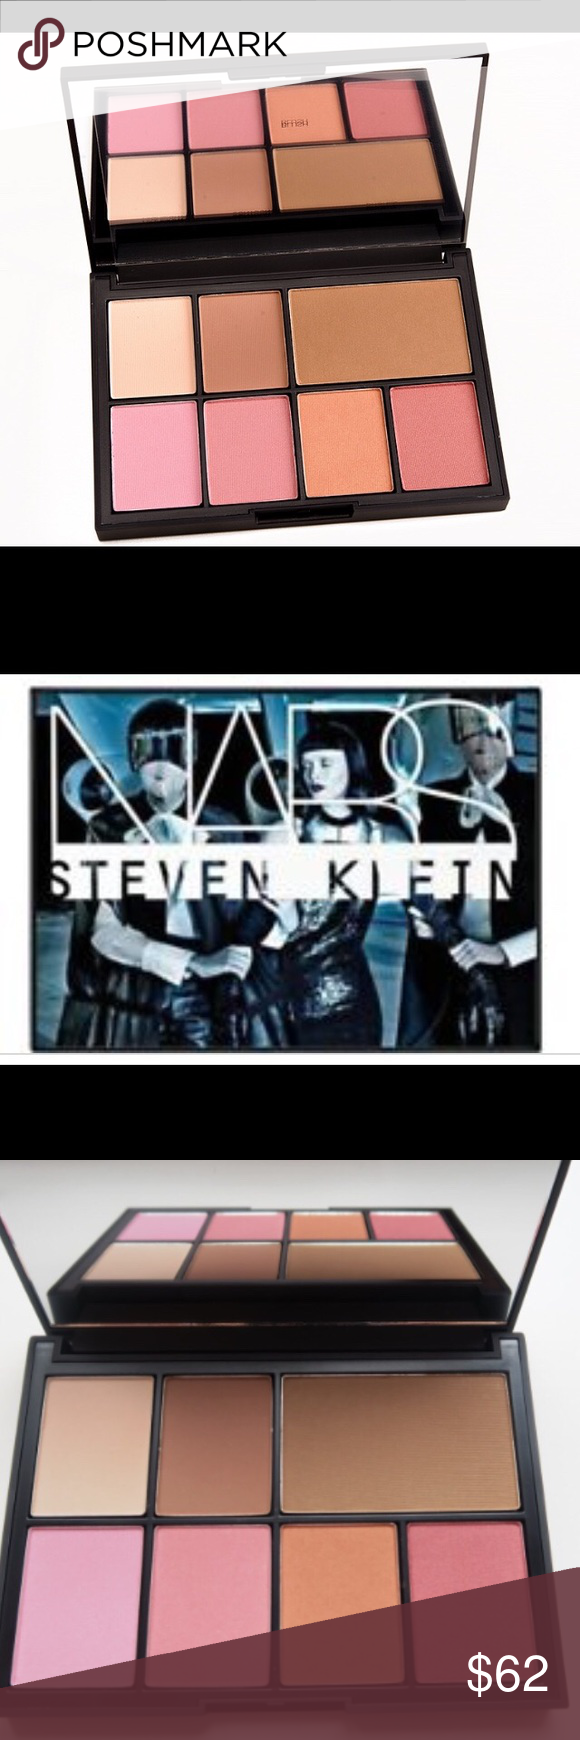 NARS Steven Klein One Shocking Moment Cheek Palett Brand